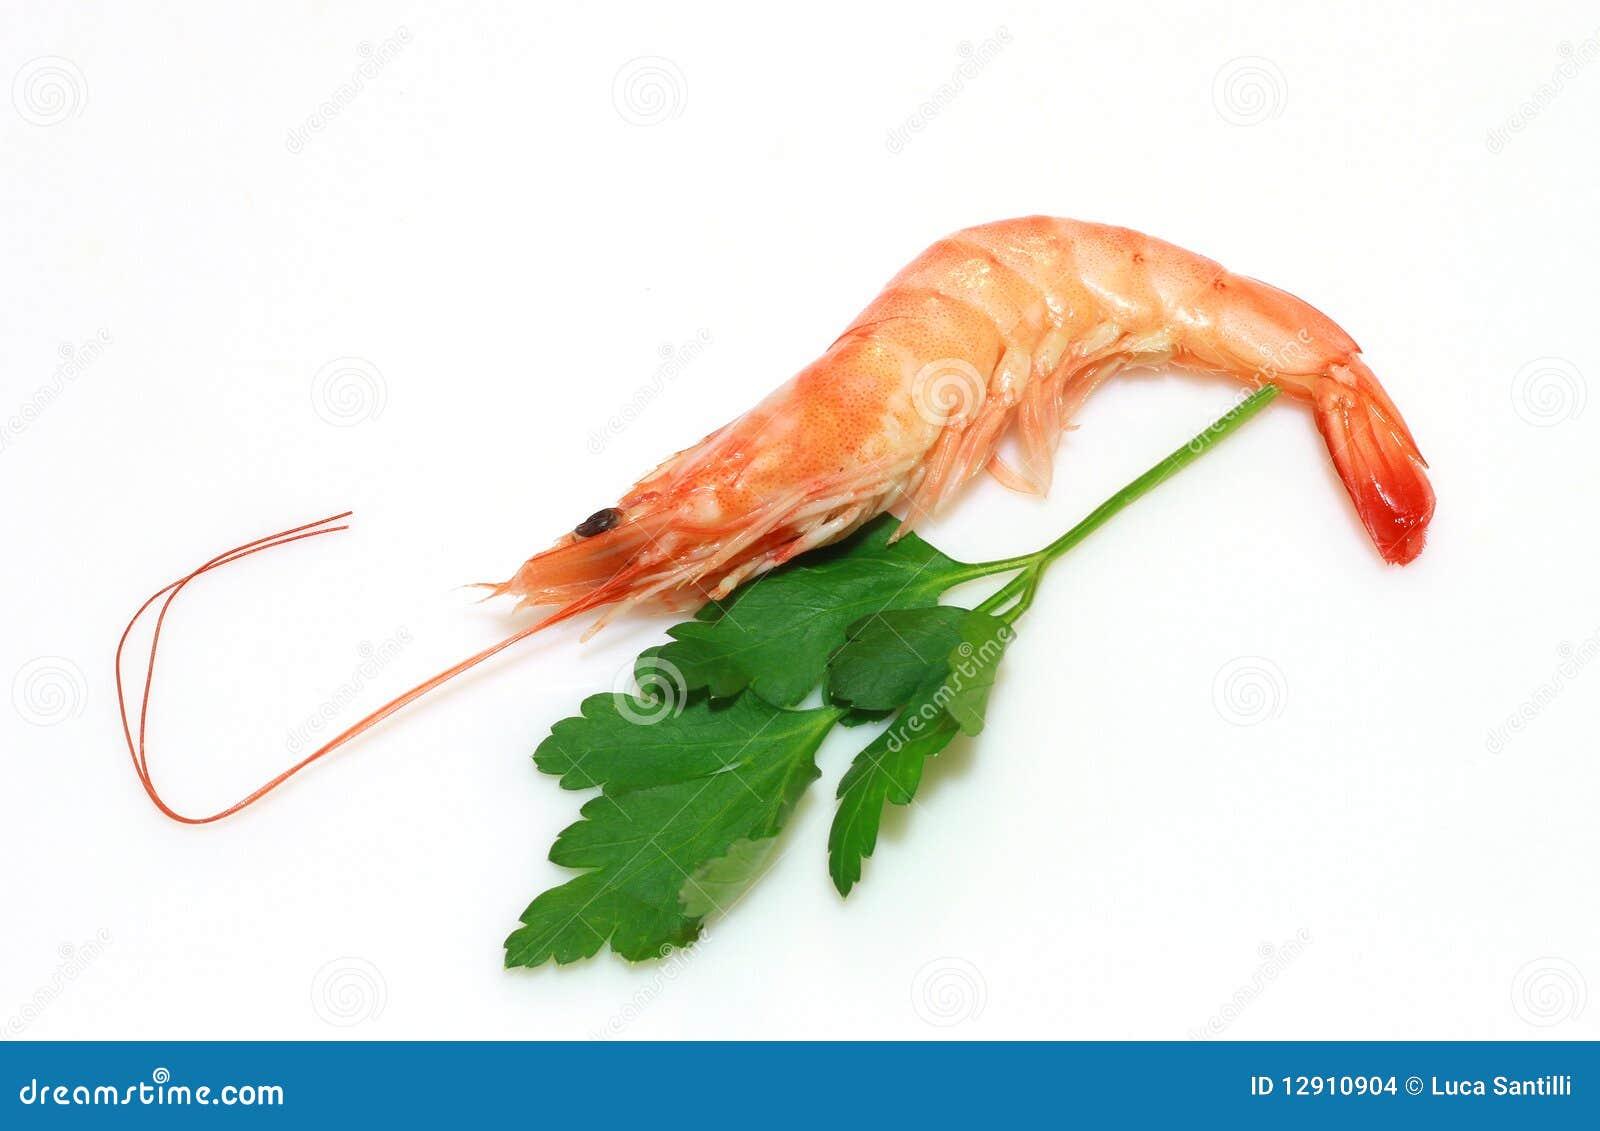 Shrimp Stock Images - Image: 12910904